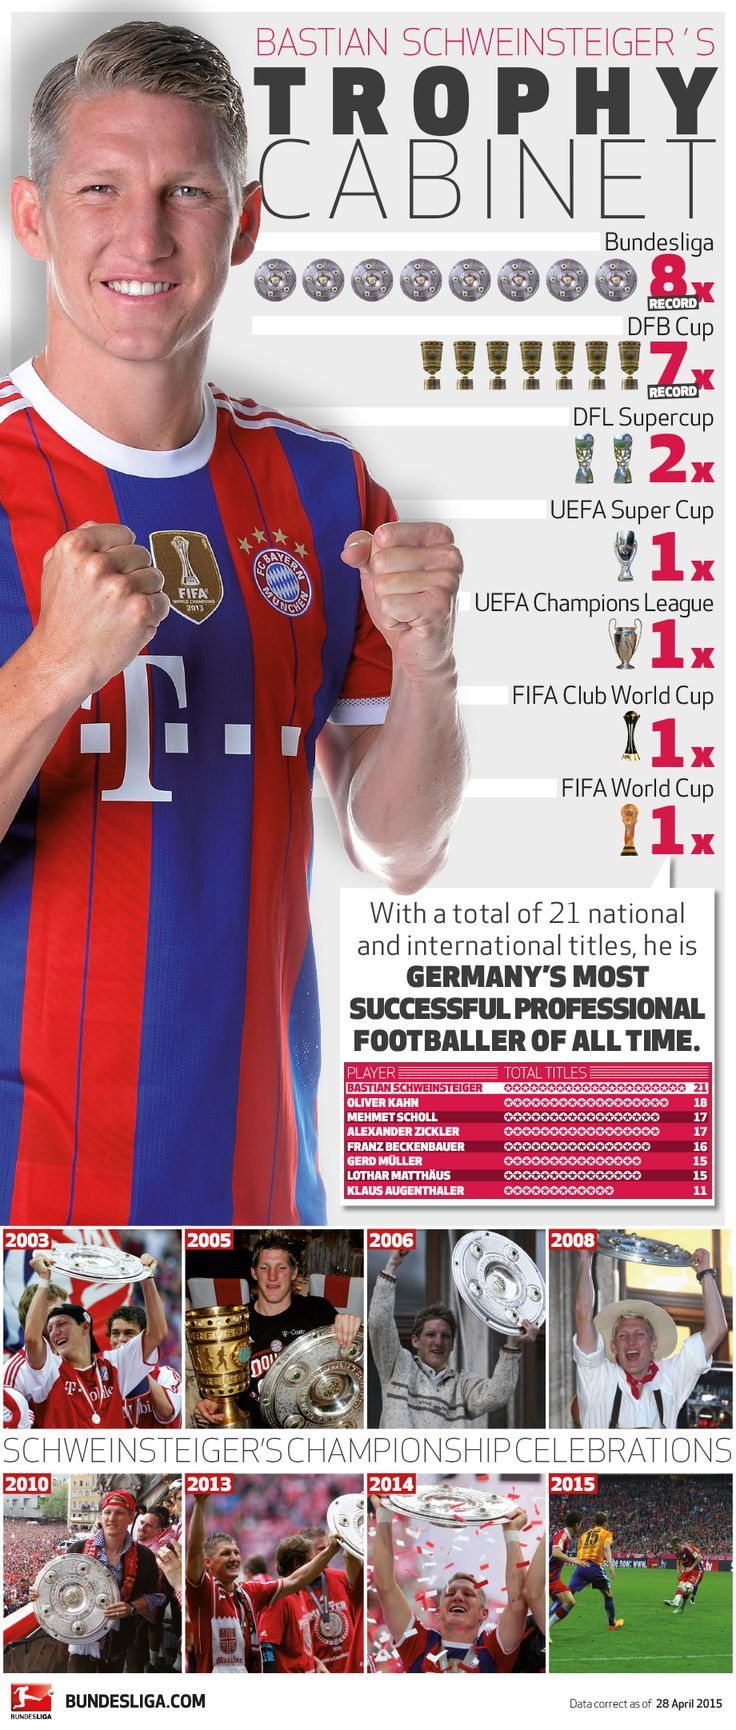 Bastian Schweinsteiger's trophy cabinet | FC Bayern Munchen - bundesliga.com – the official Bundesliga website